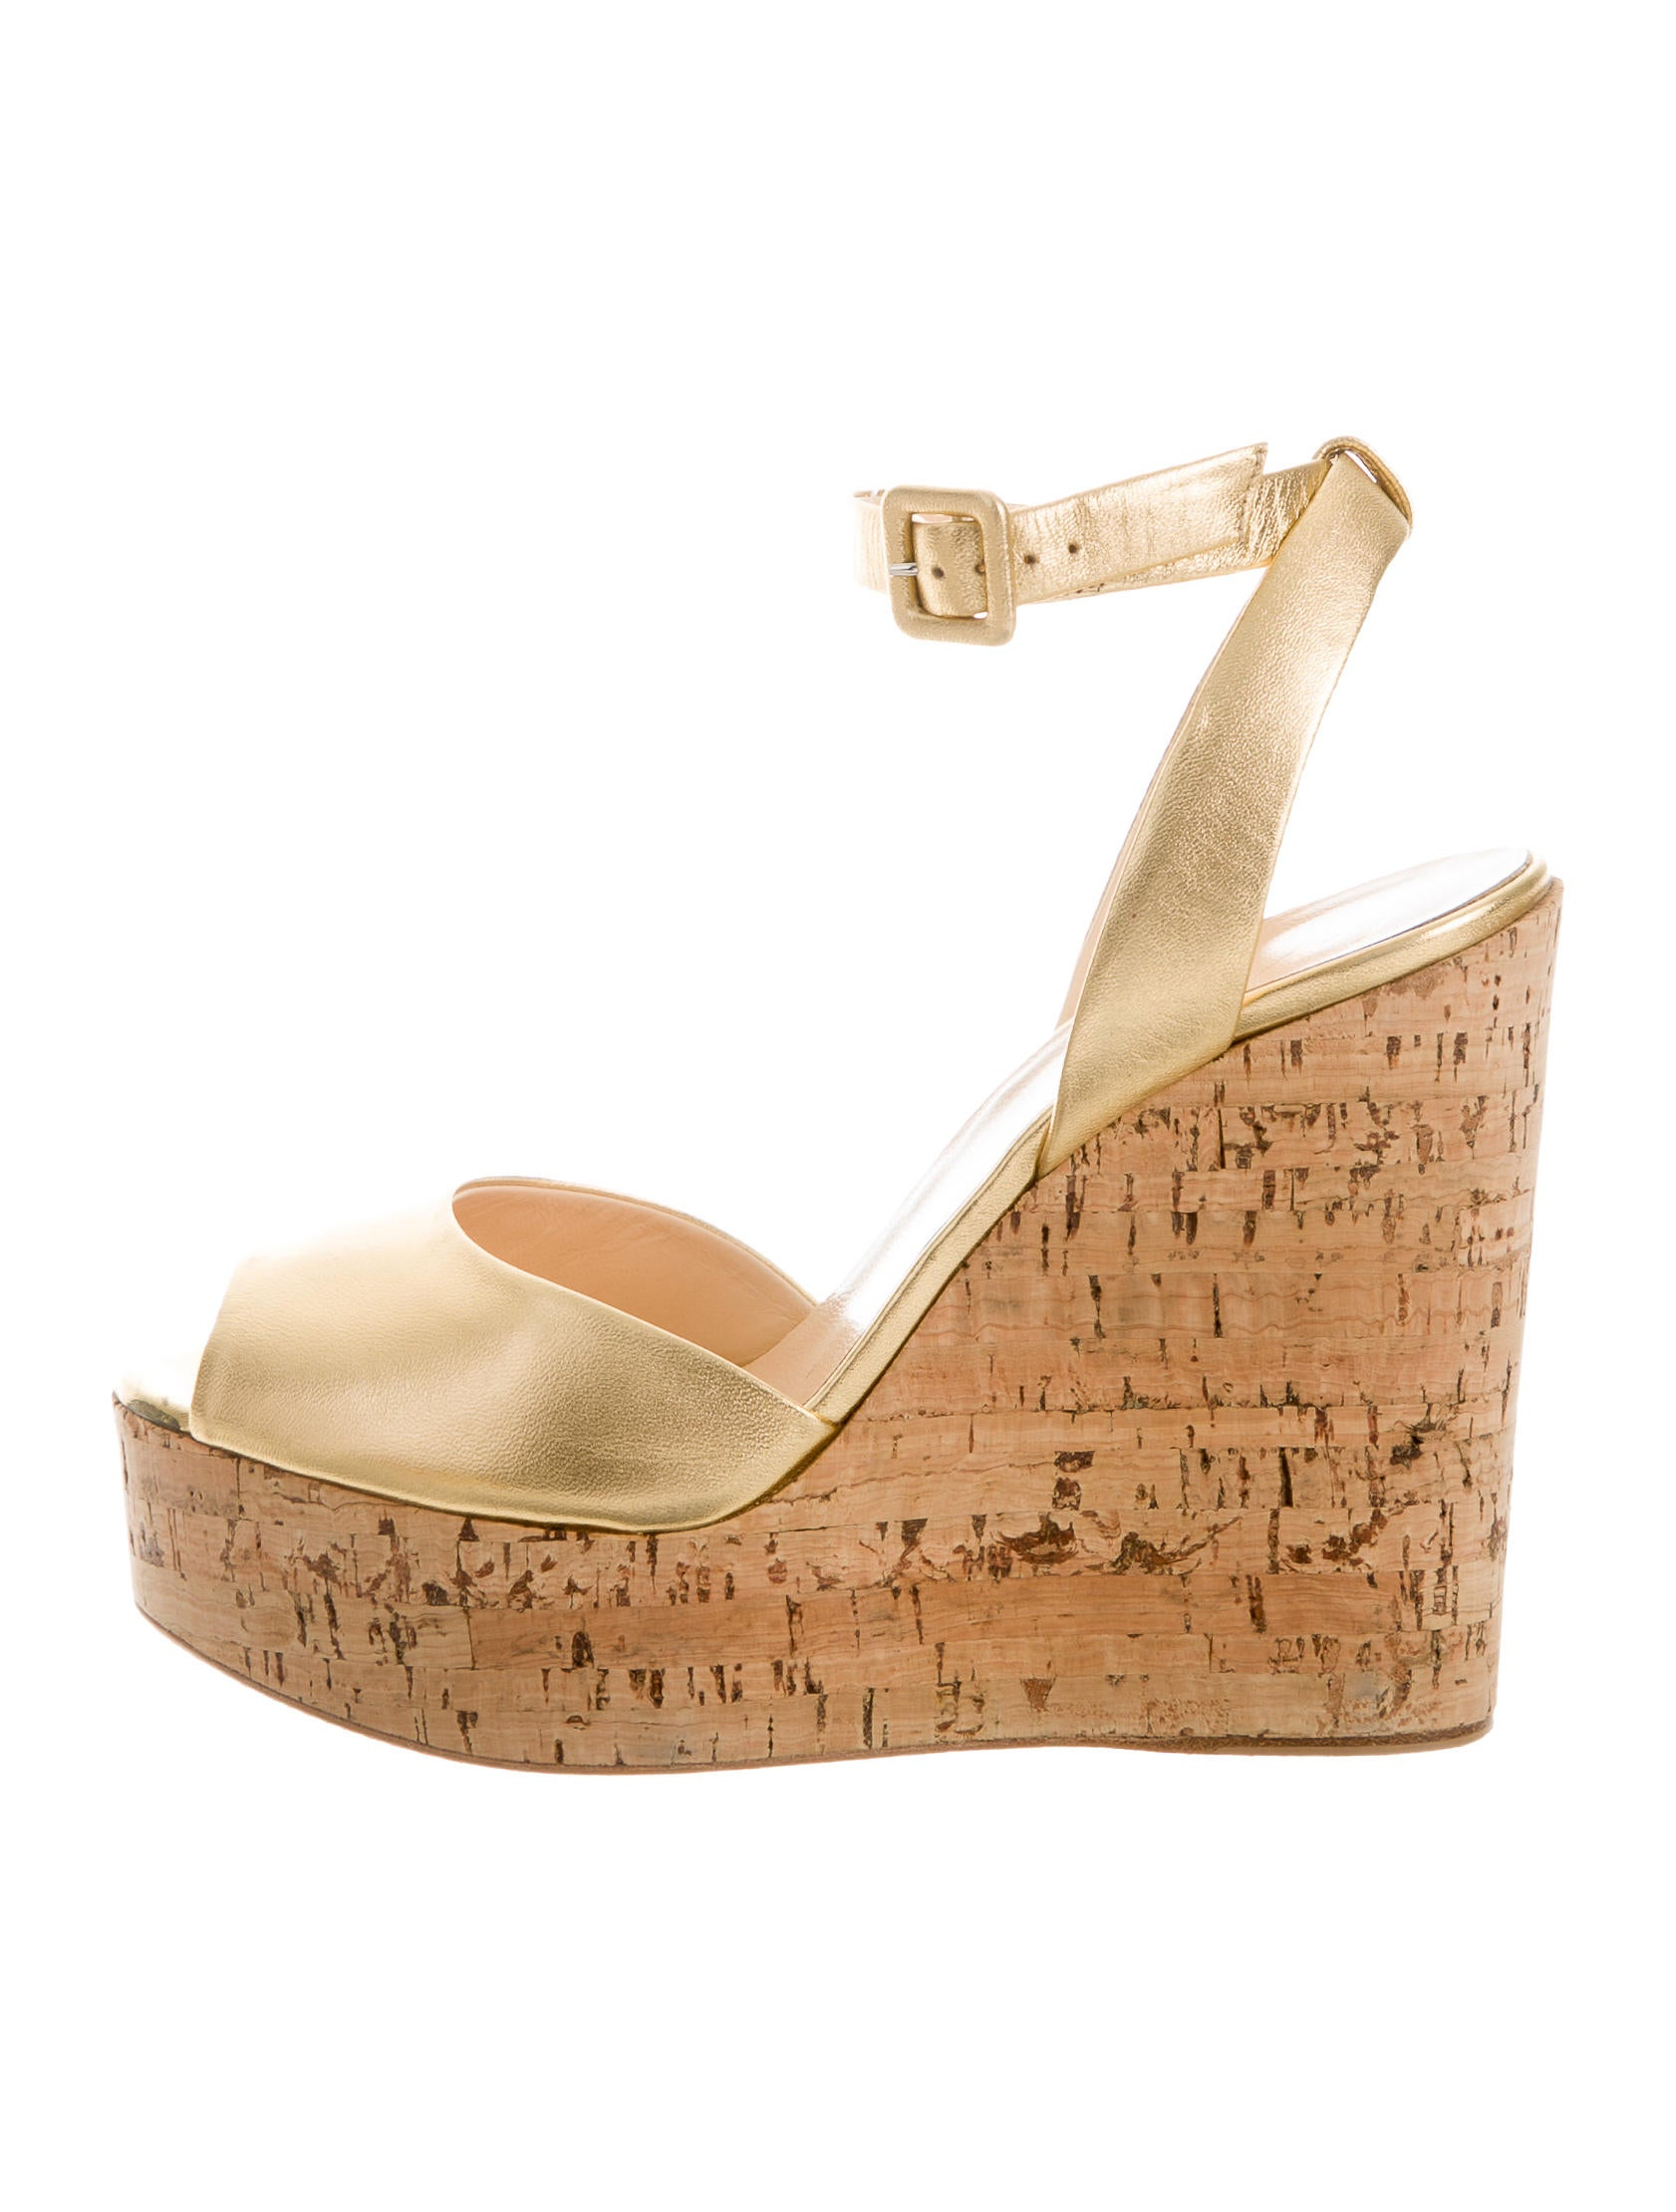 giuseppe zanotti metallic wedge sandals shoes giu31842